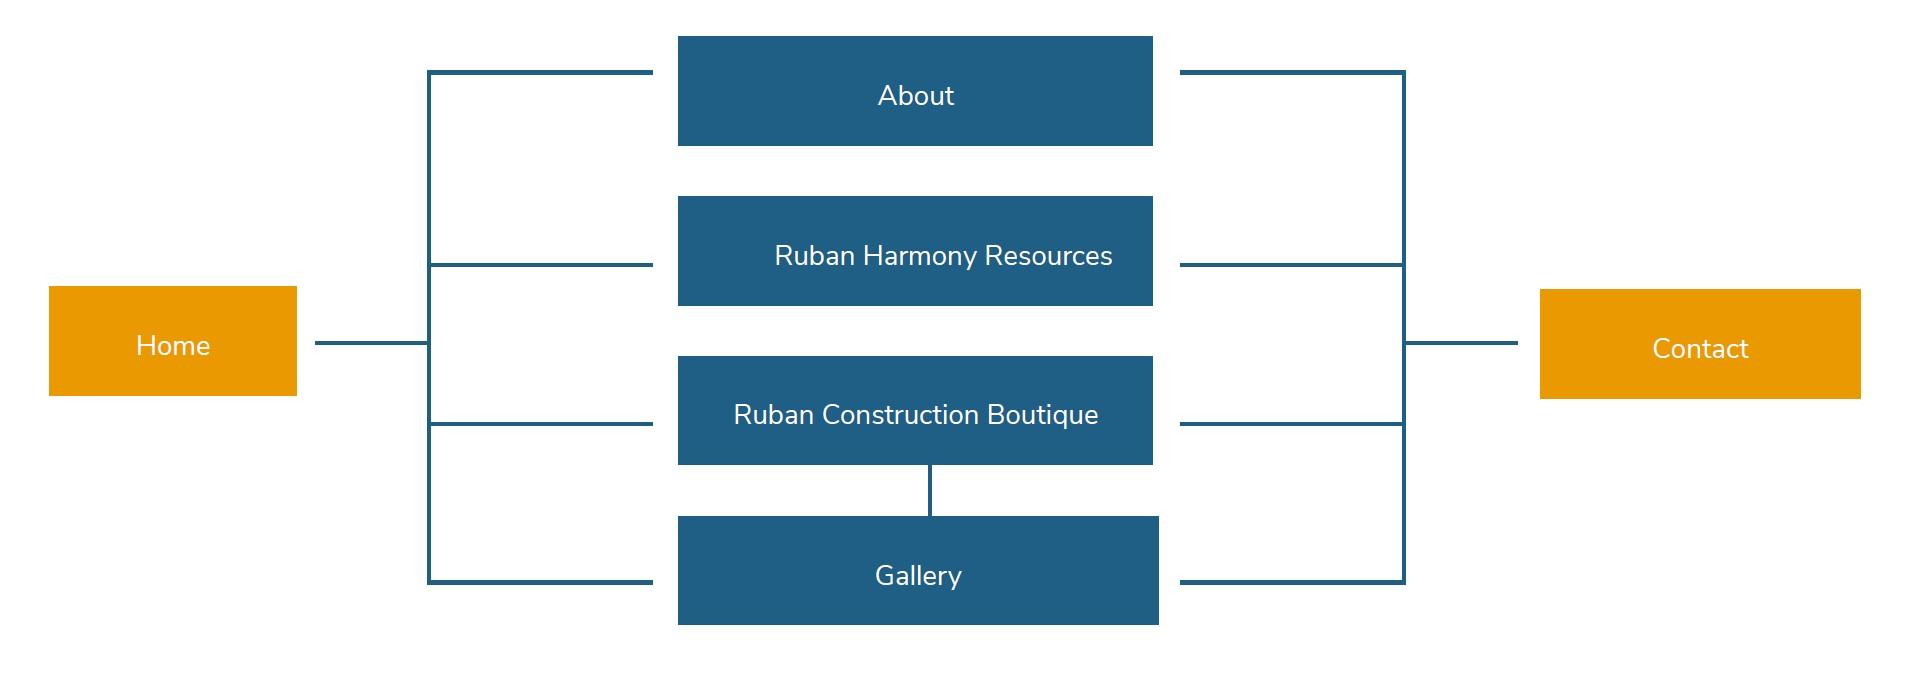 Ruban Jamaica's sitemap structure